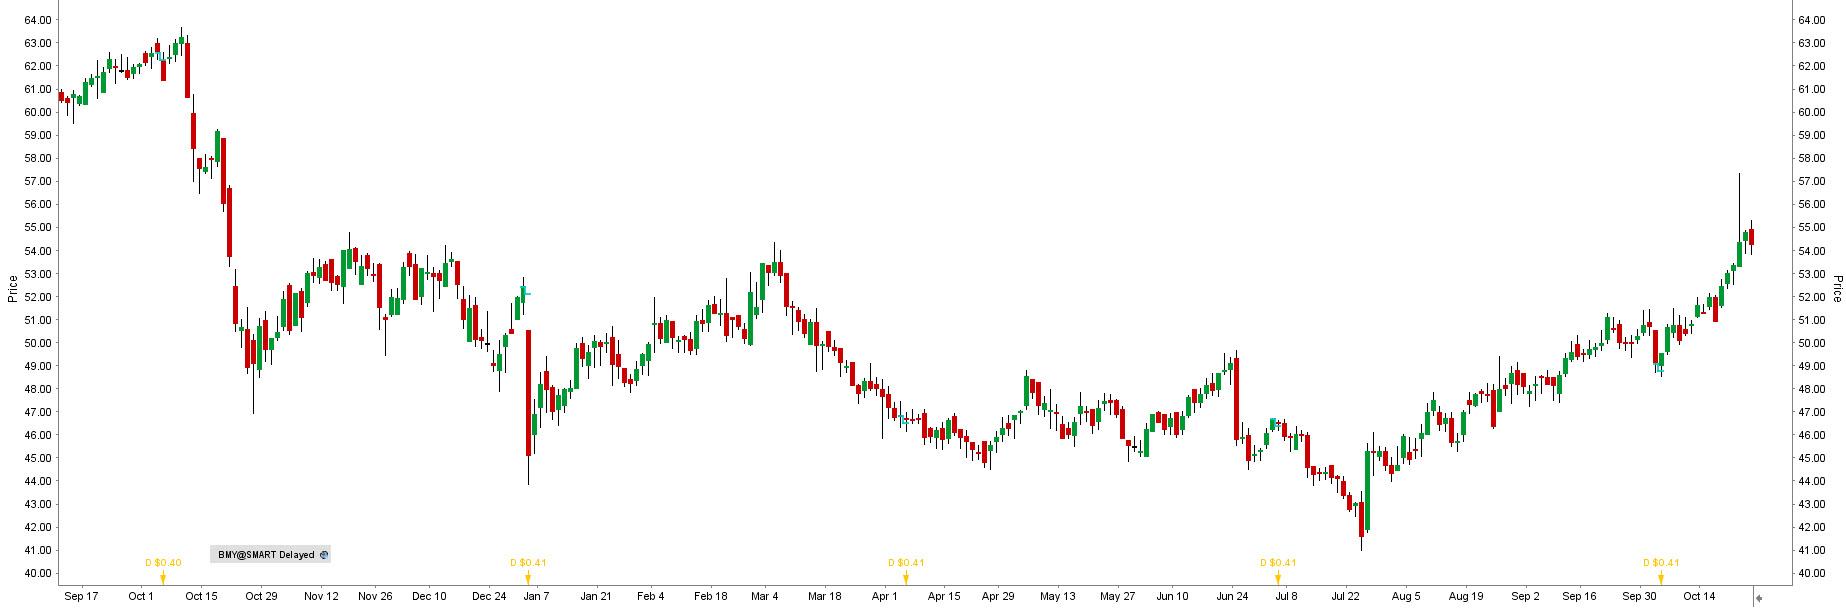 Akcie Bristol-Myers Squibb - graf